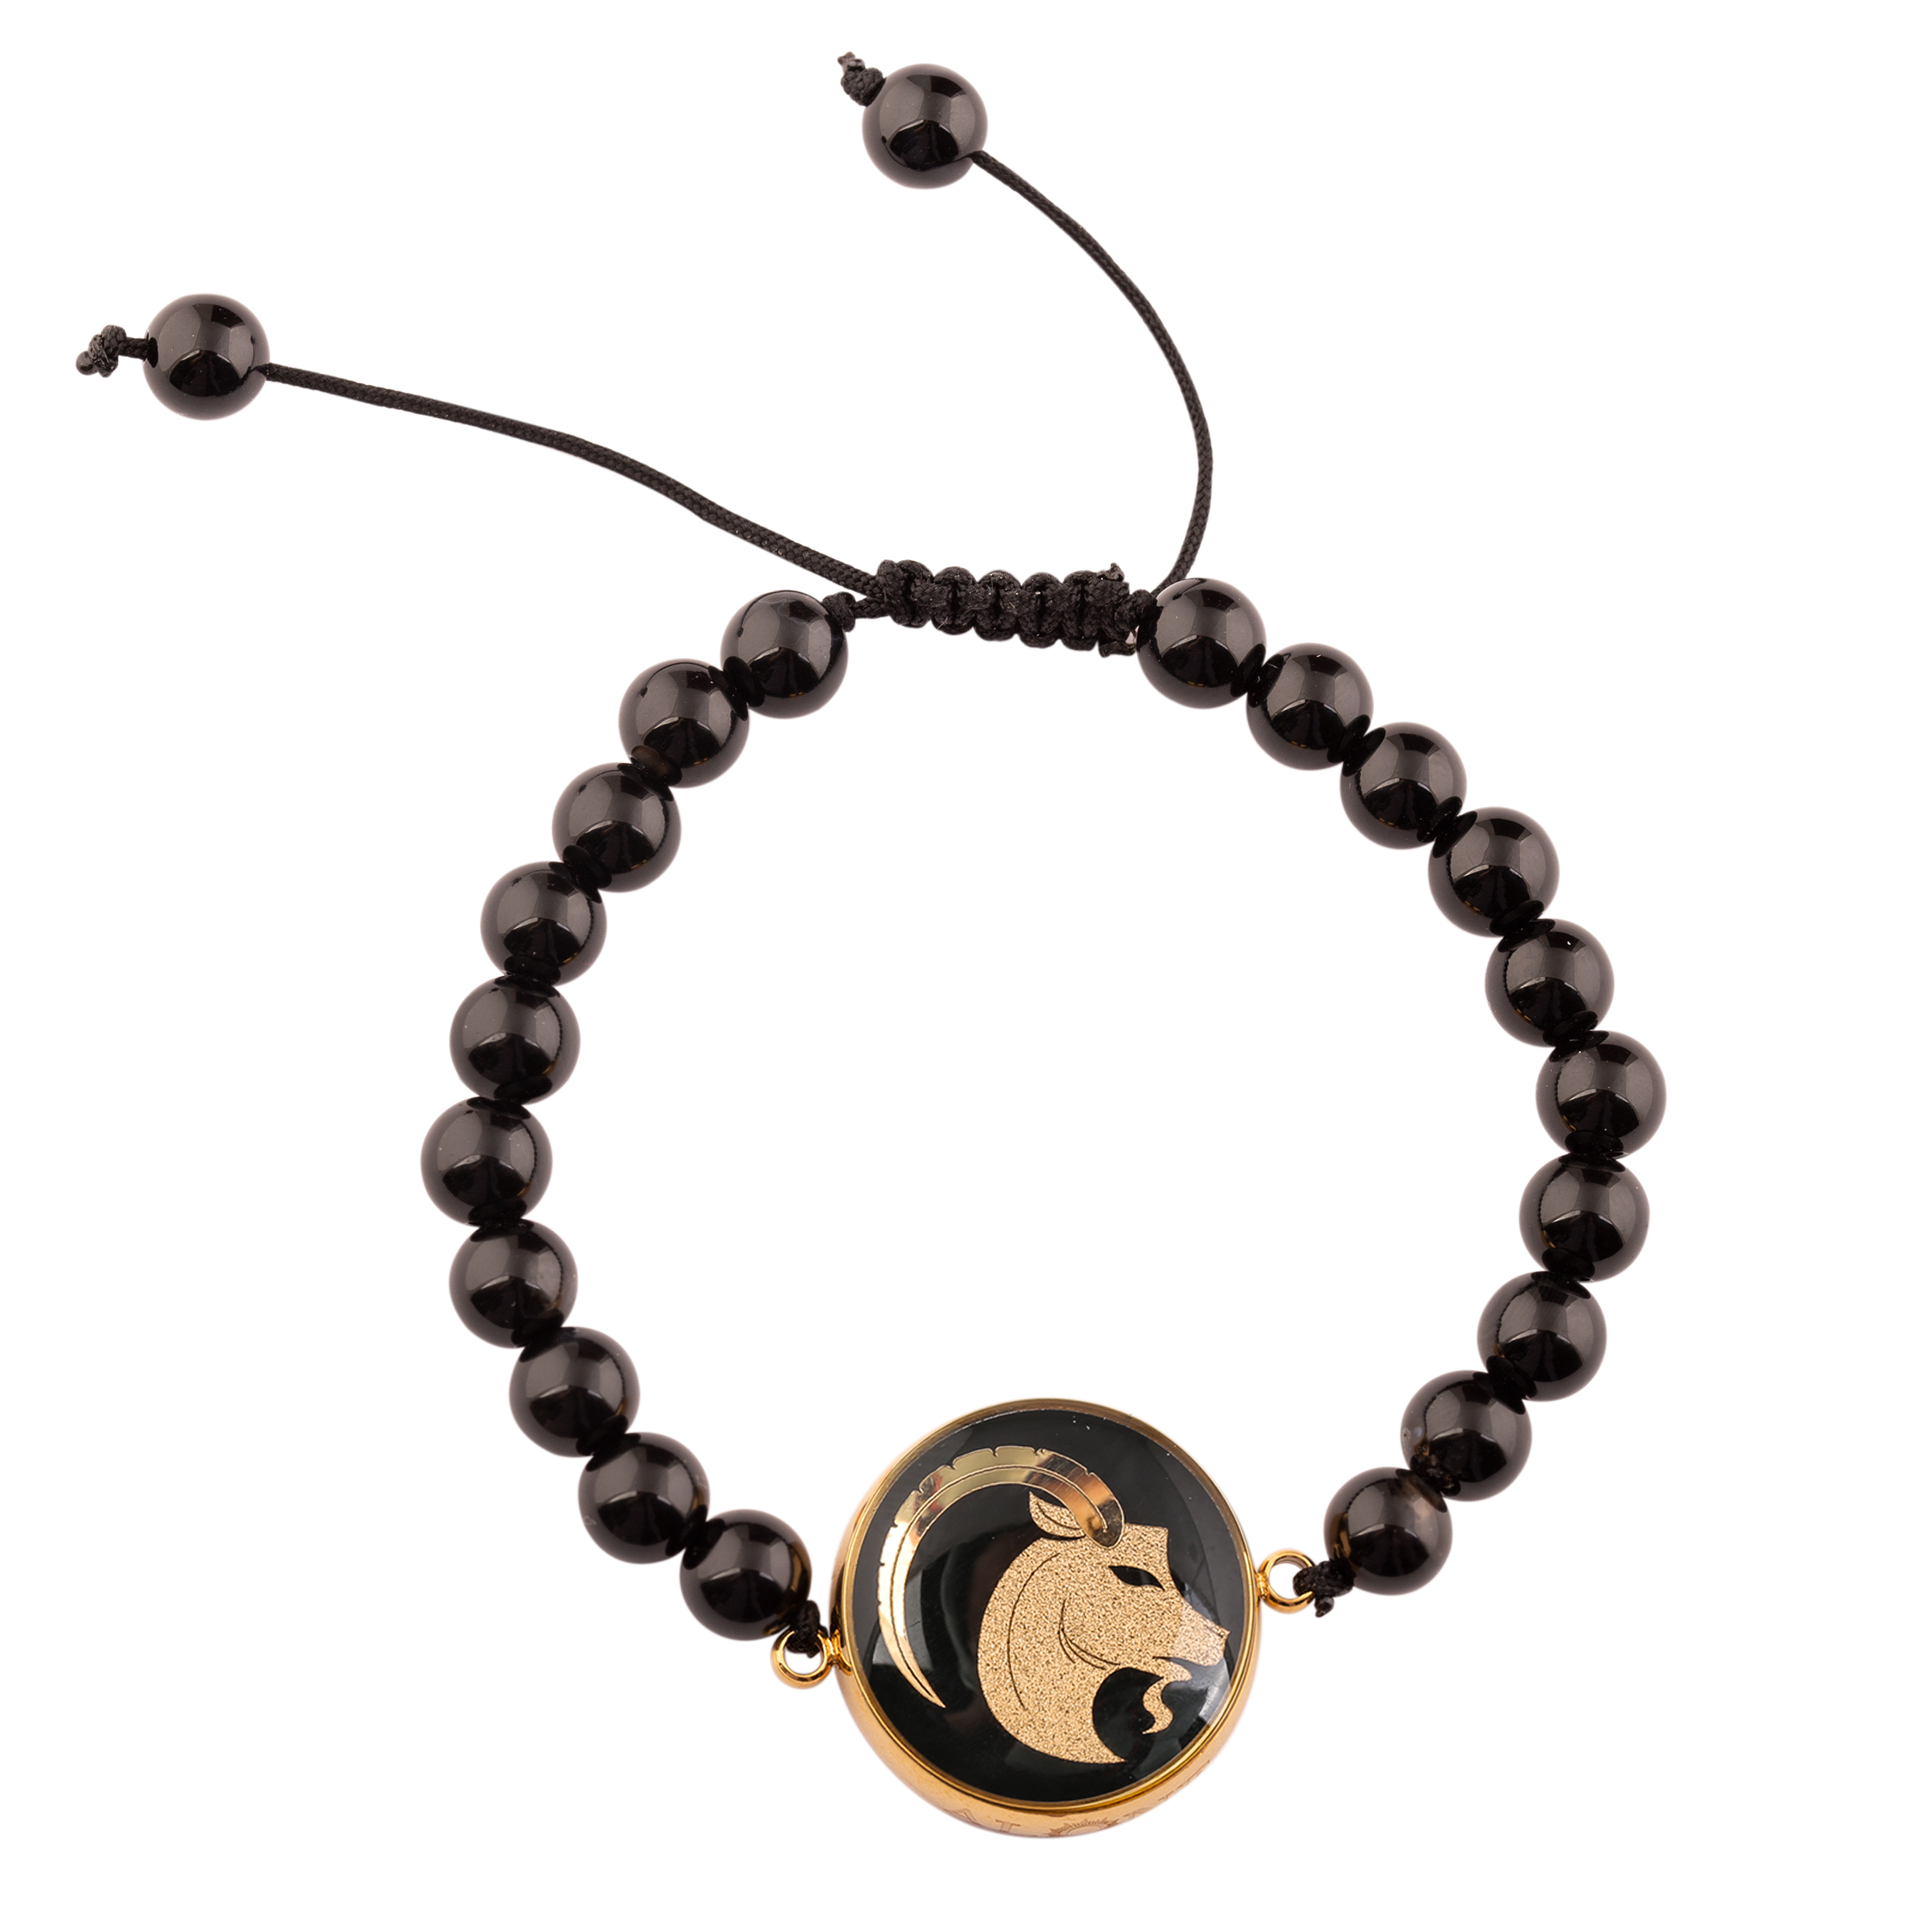 دستبند طلا 24 عیار زنانه الون طرح ماه دی